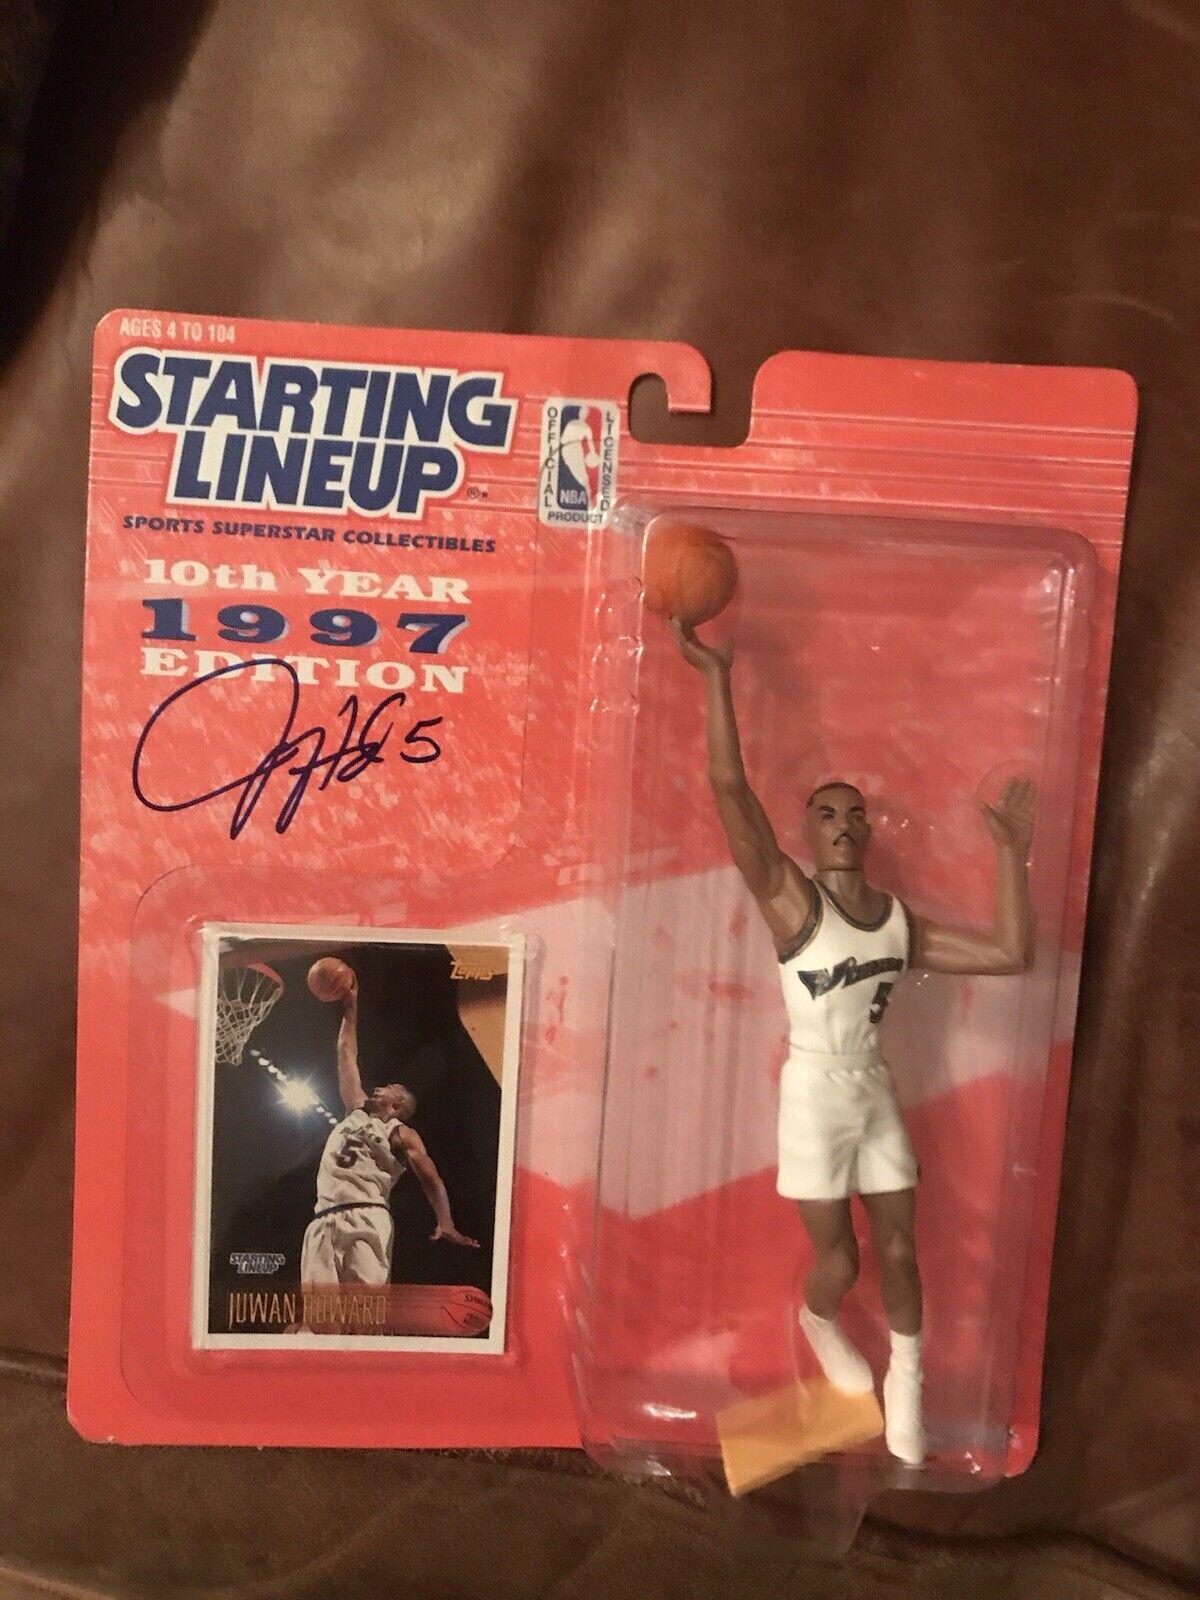 1996 JUWAN HOWARD  estrellating Lineup  Sports Figurine - Washington Bullets Signed  punti vendita